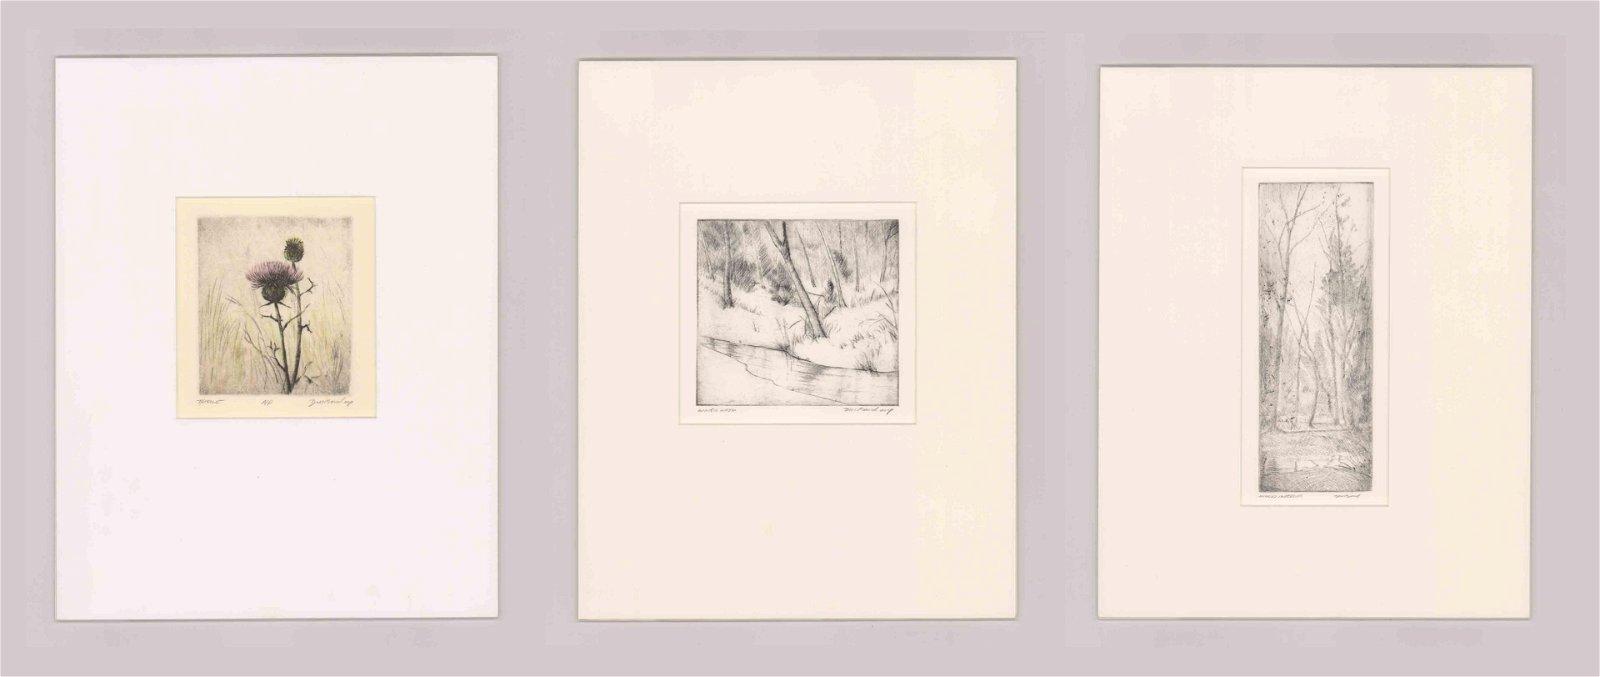 David M. Band Etchings [Landscape]